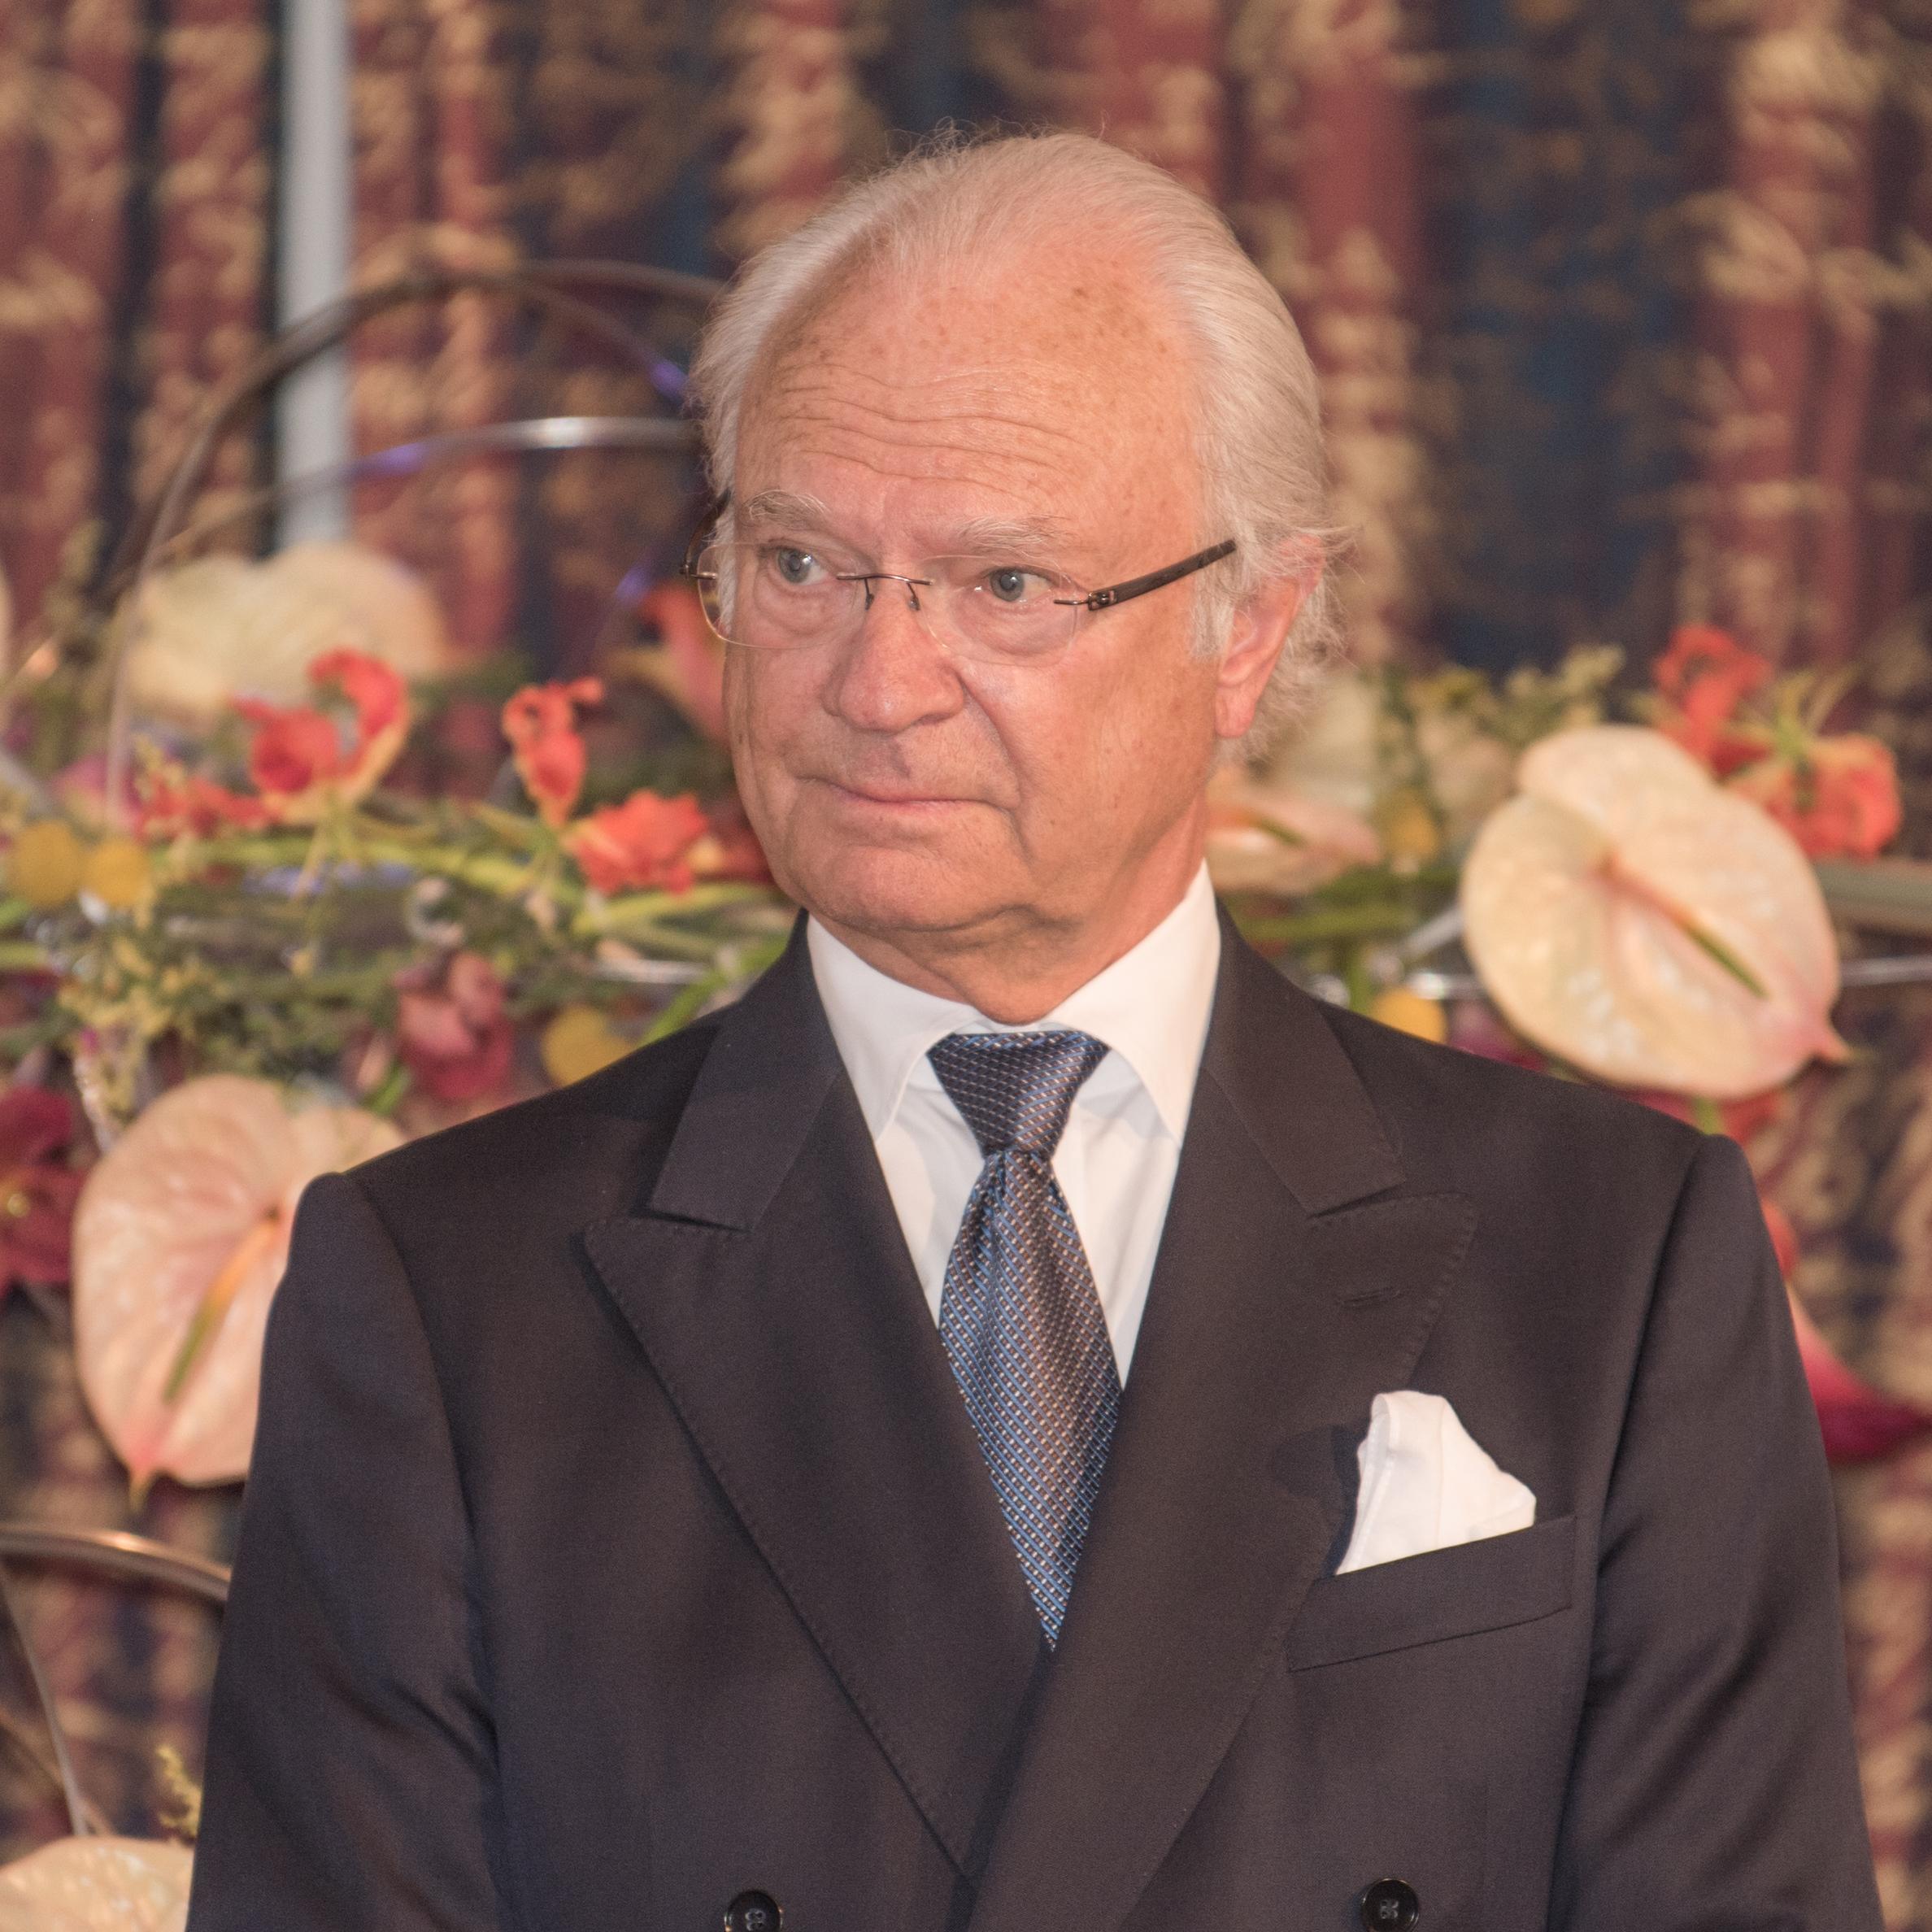 4195335cdda7e Carl XVI Gustaf of Sweden - Wikipedia